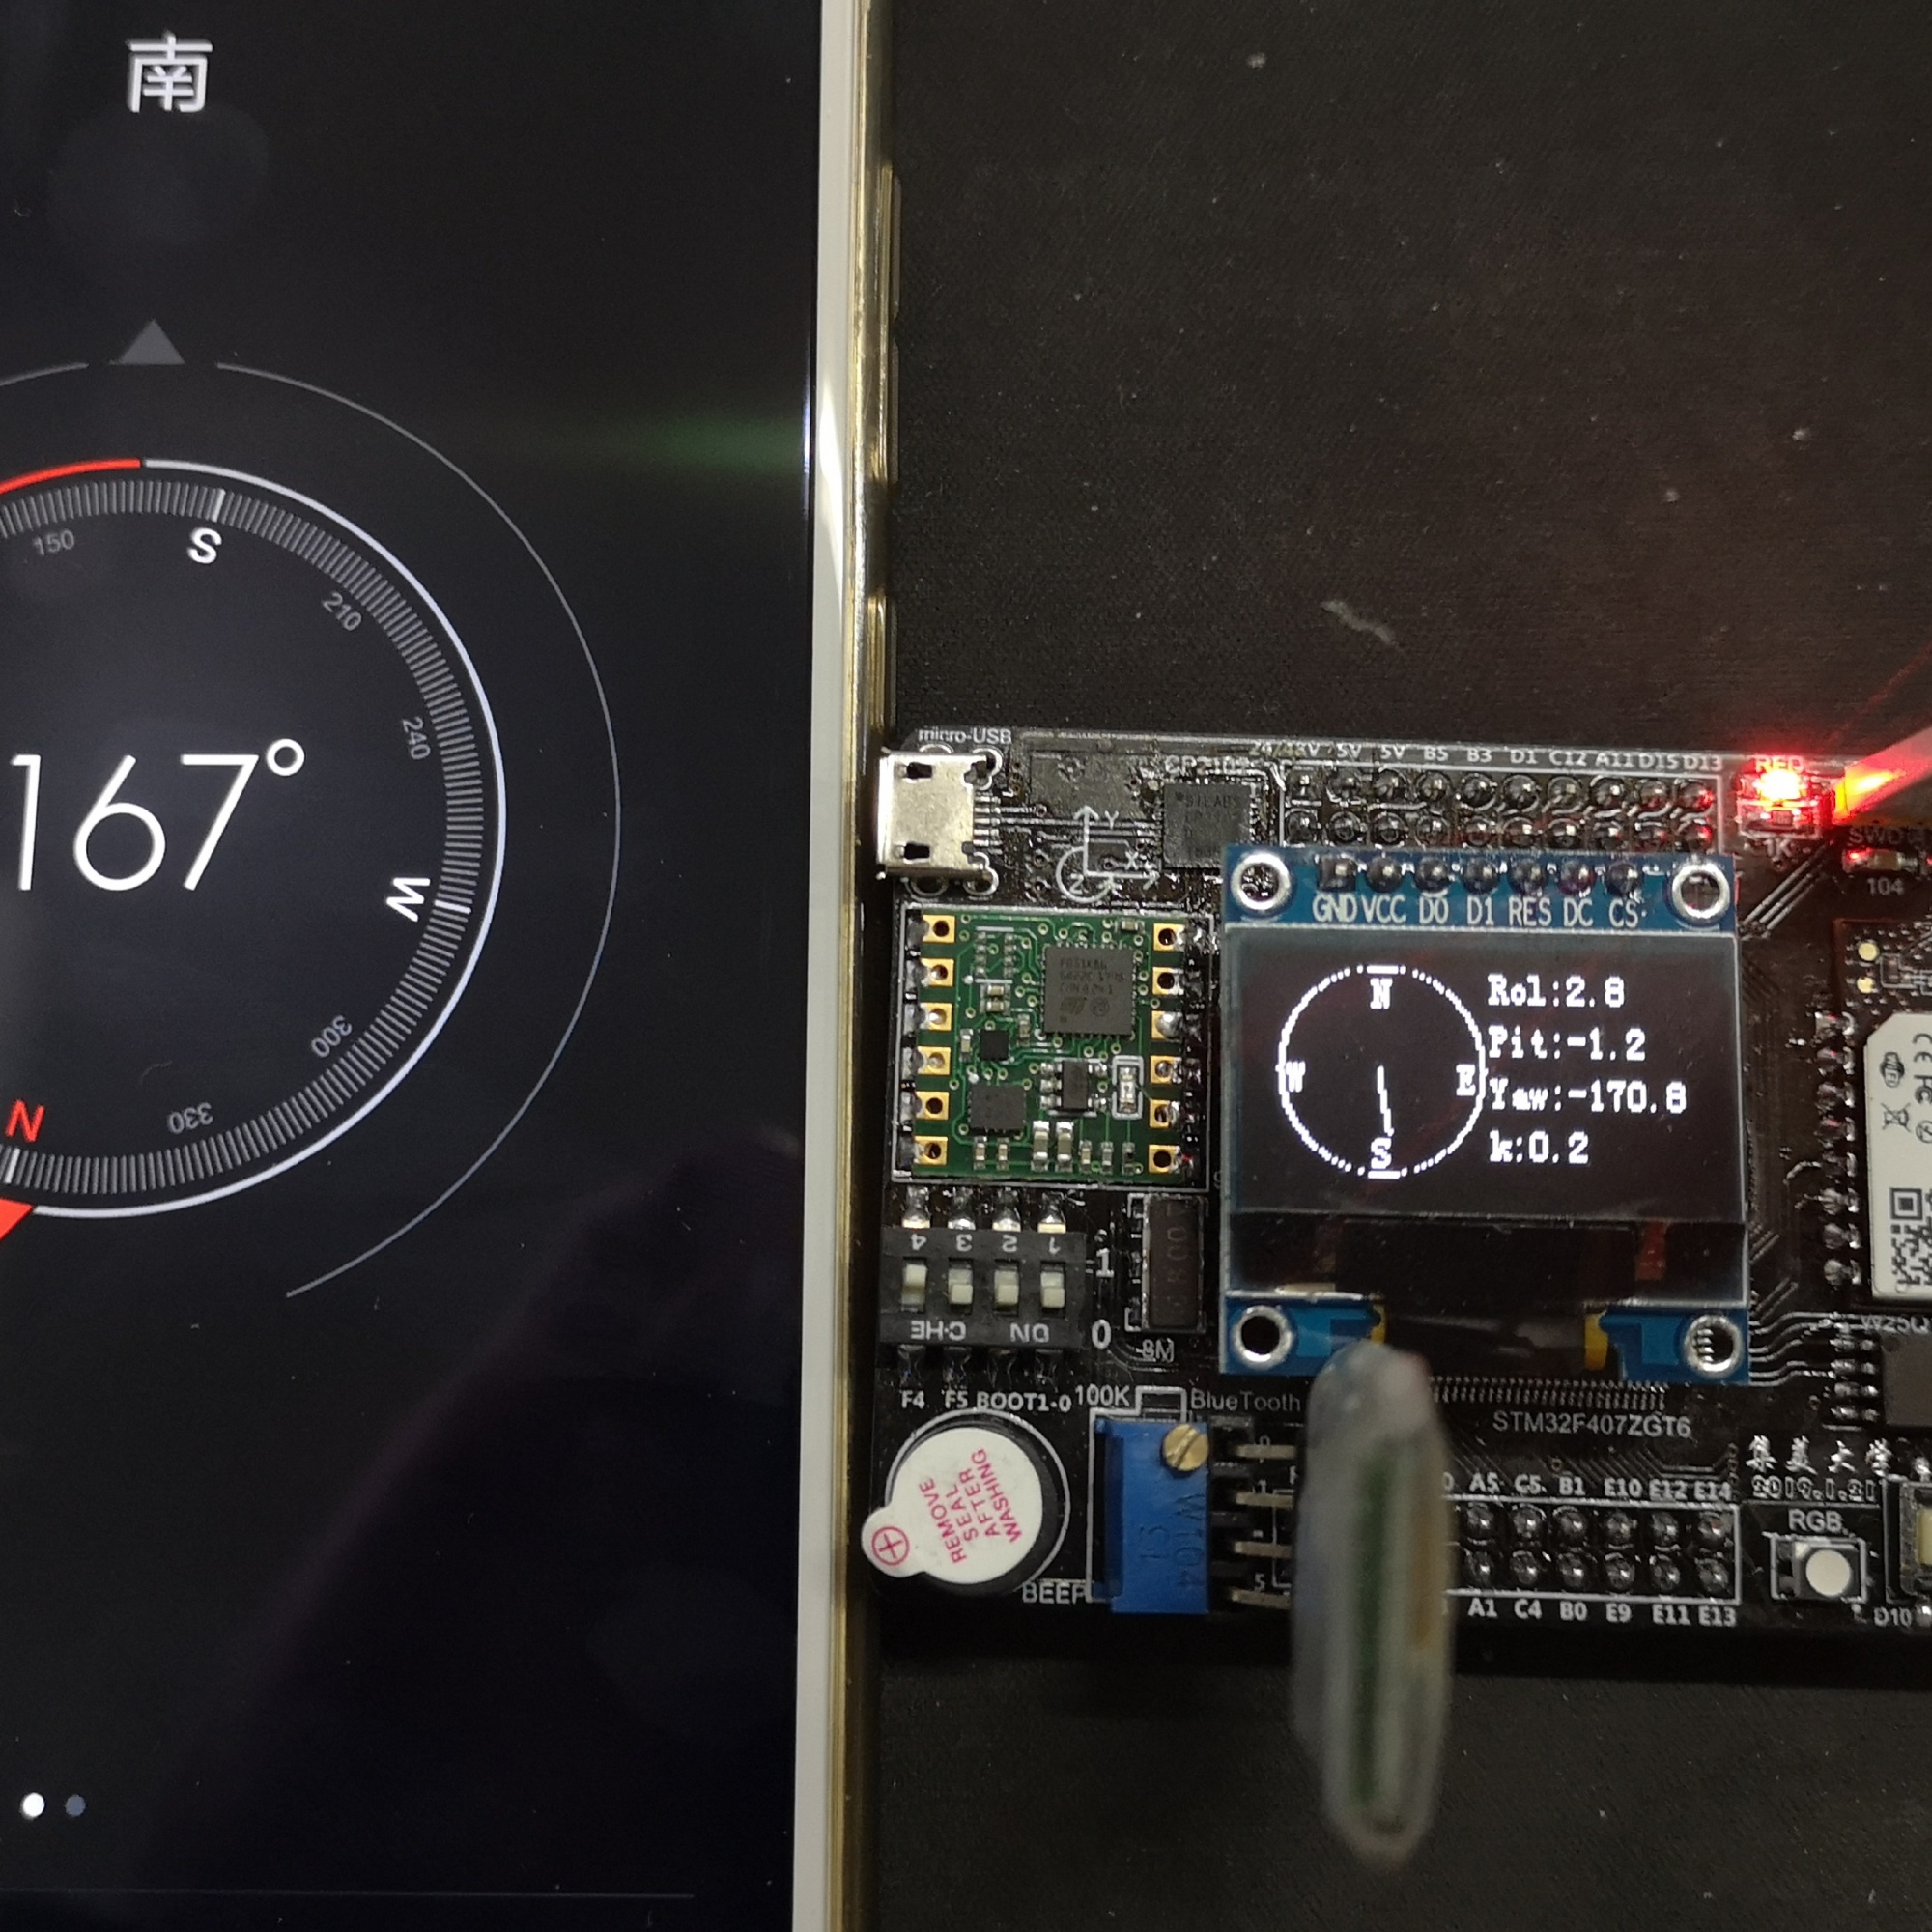 【小项目程序分享】STM32 OLED打点划线画圆 OLED电子罗盘